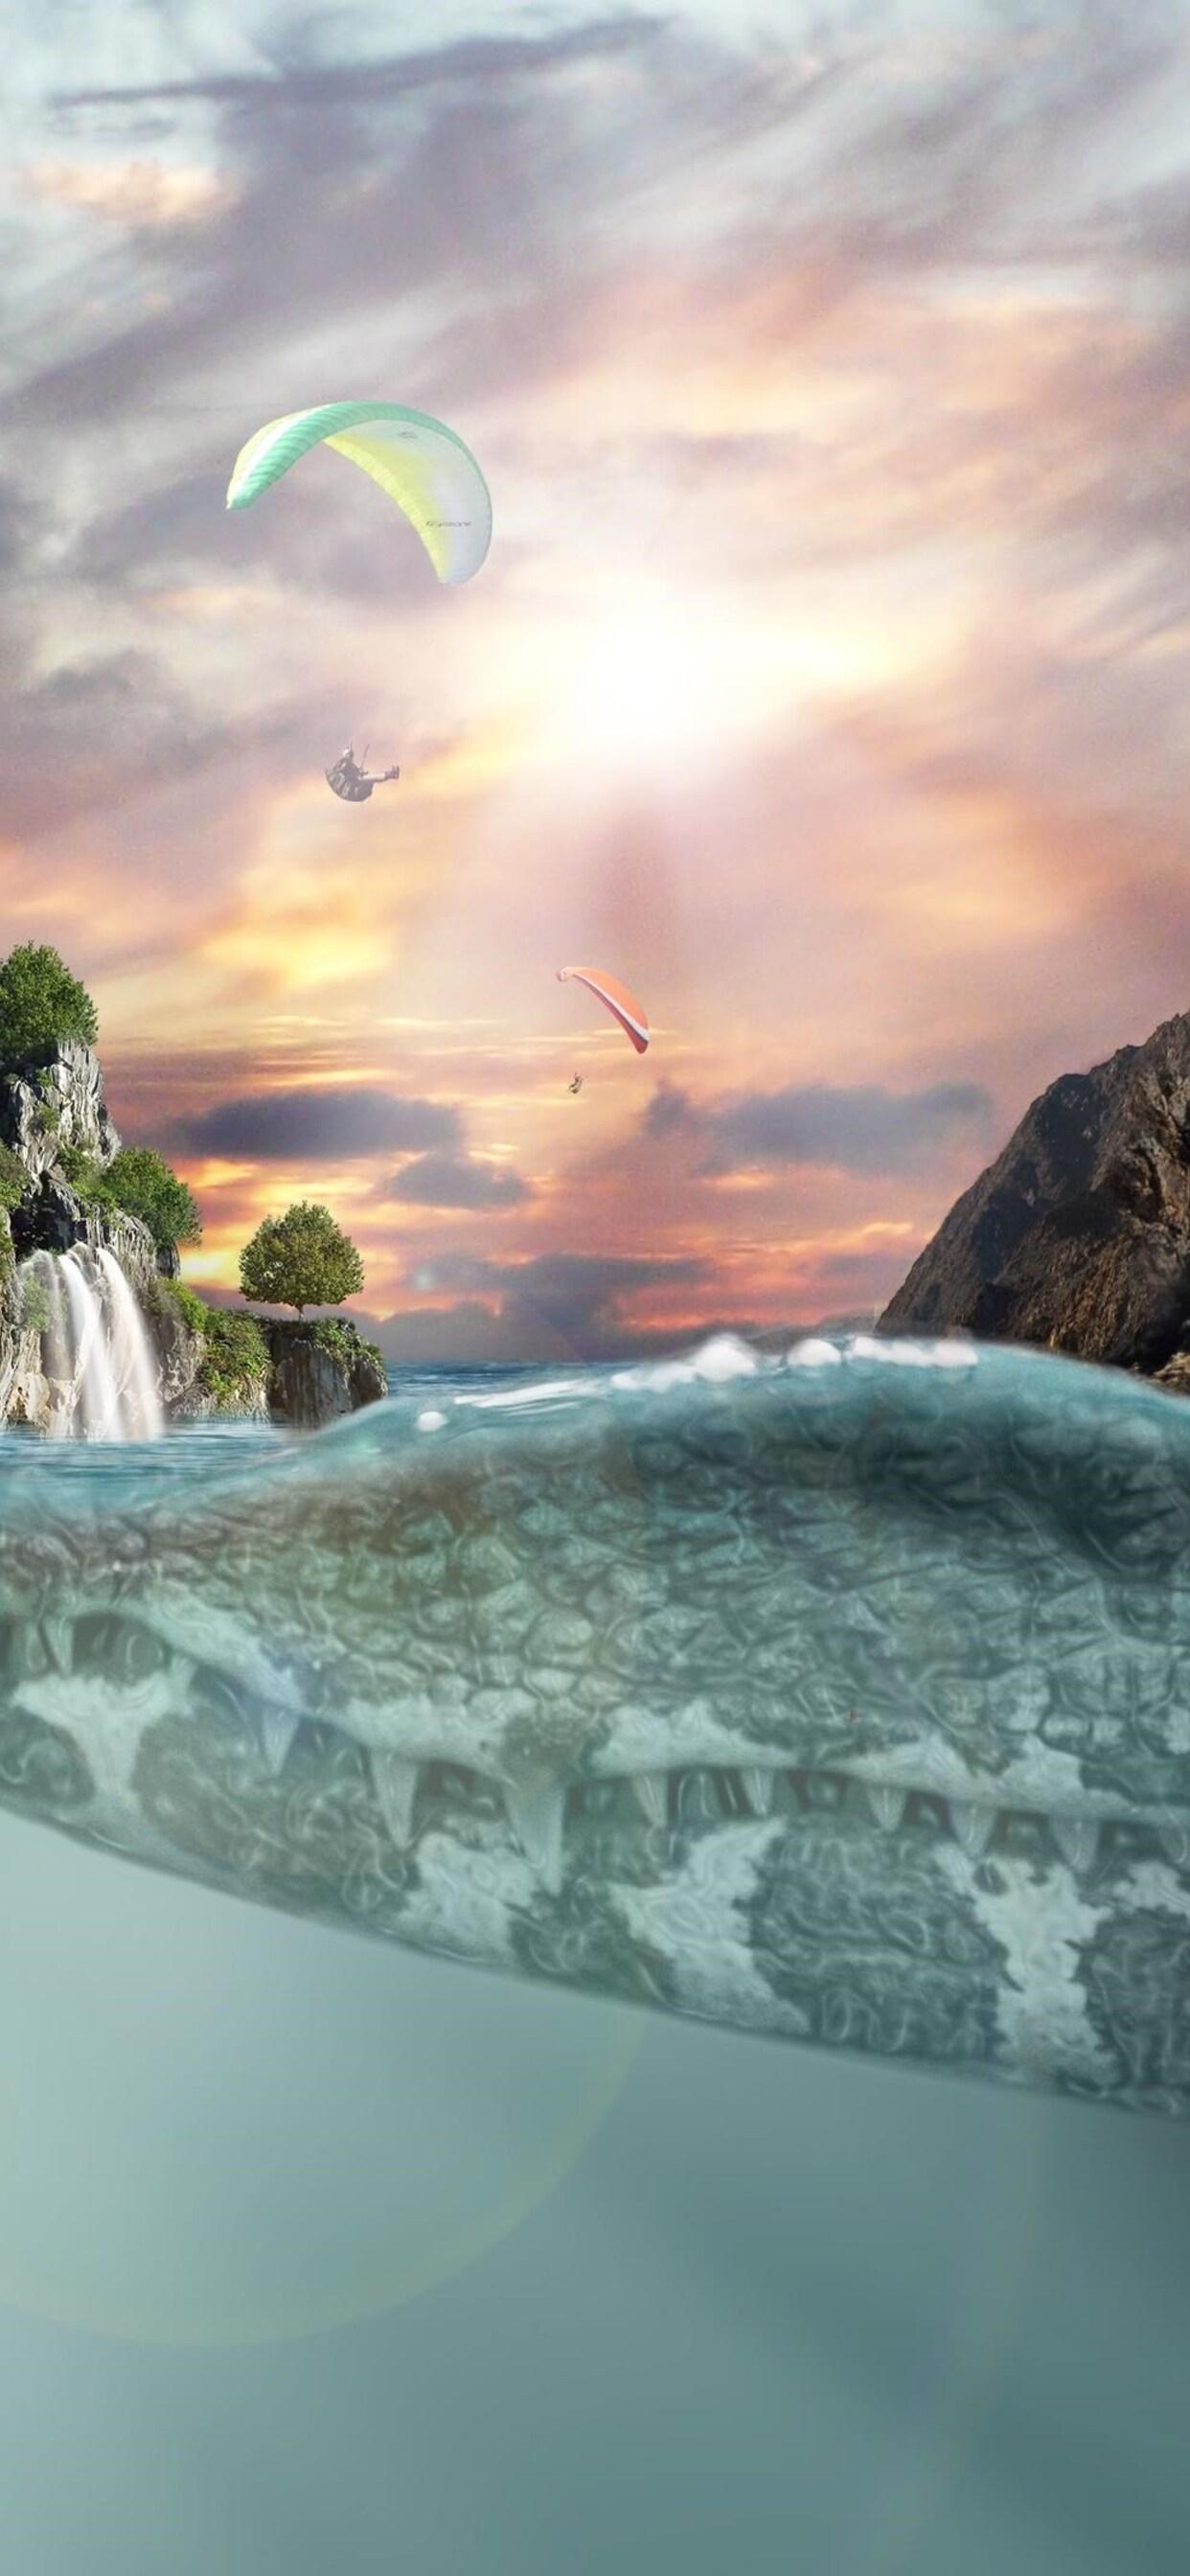 sea-island-fantasy-hd.jpg